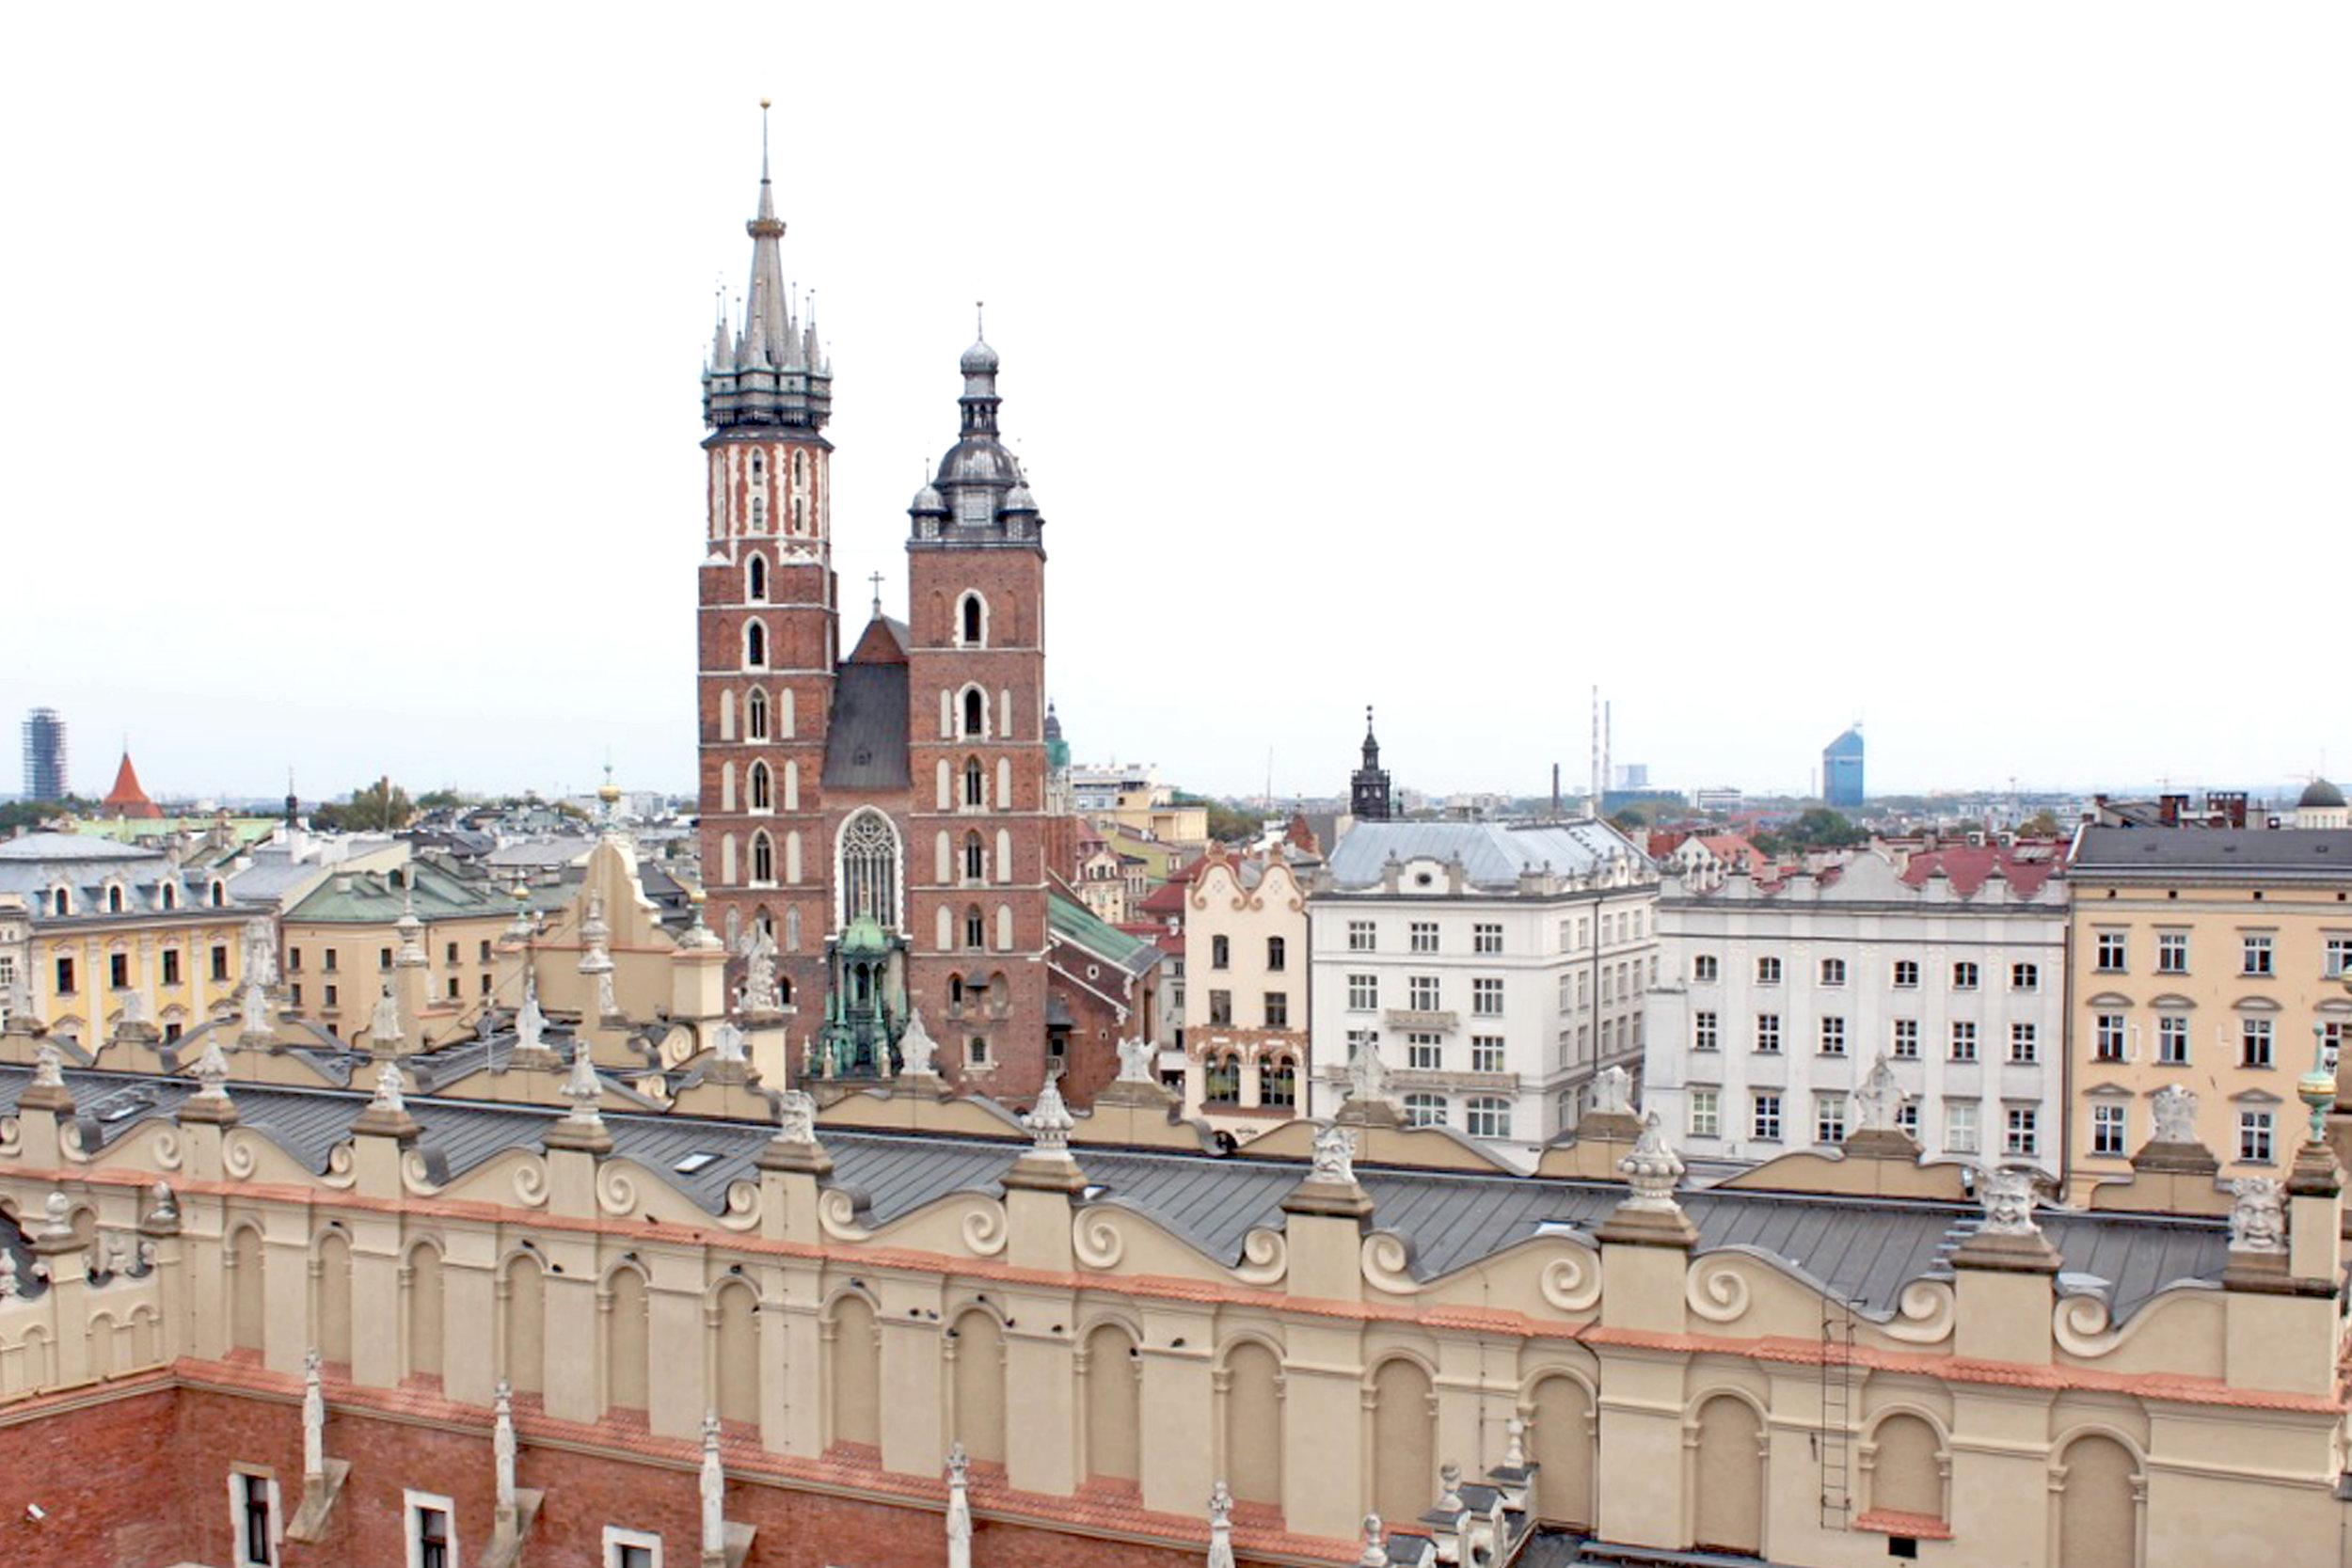 Krakow - Auschwitz: a weekend to world history